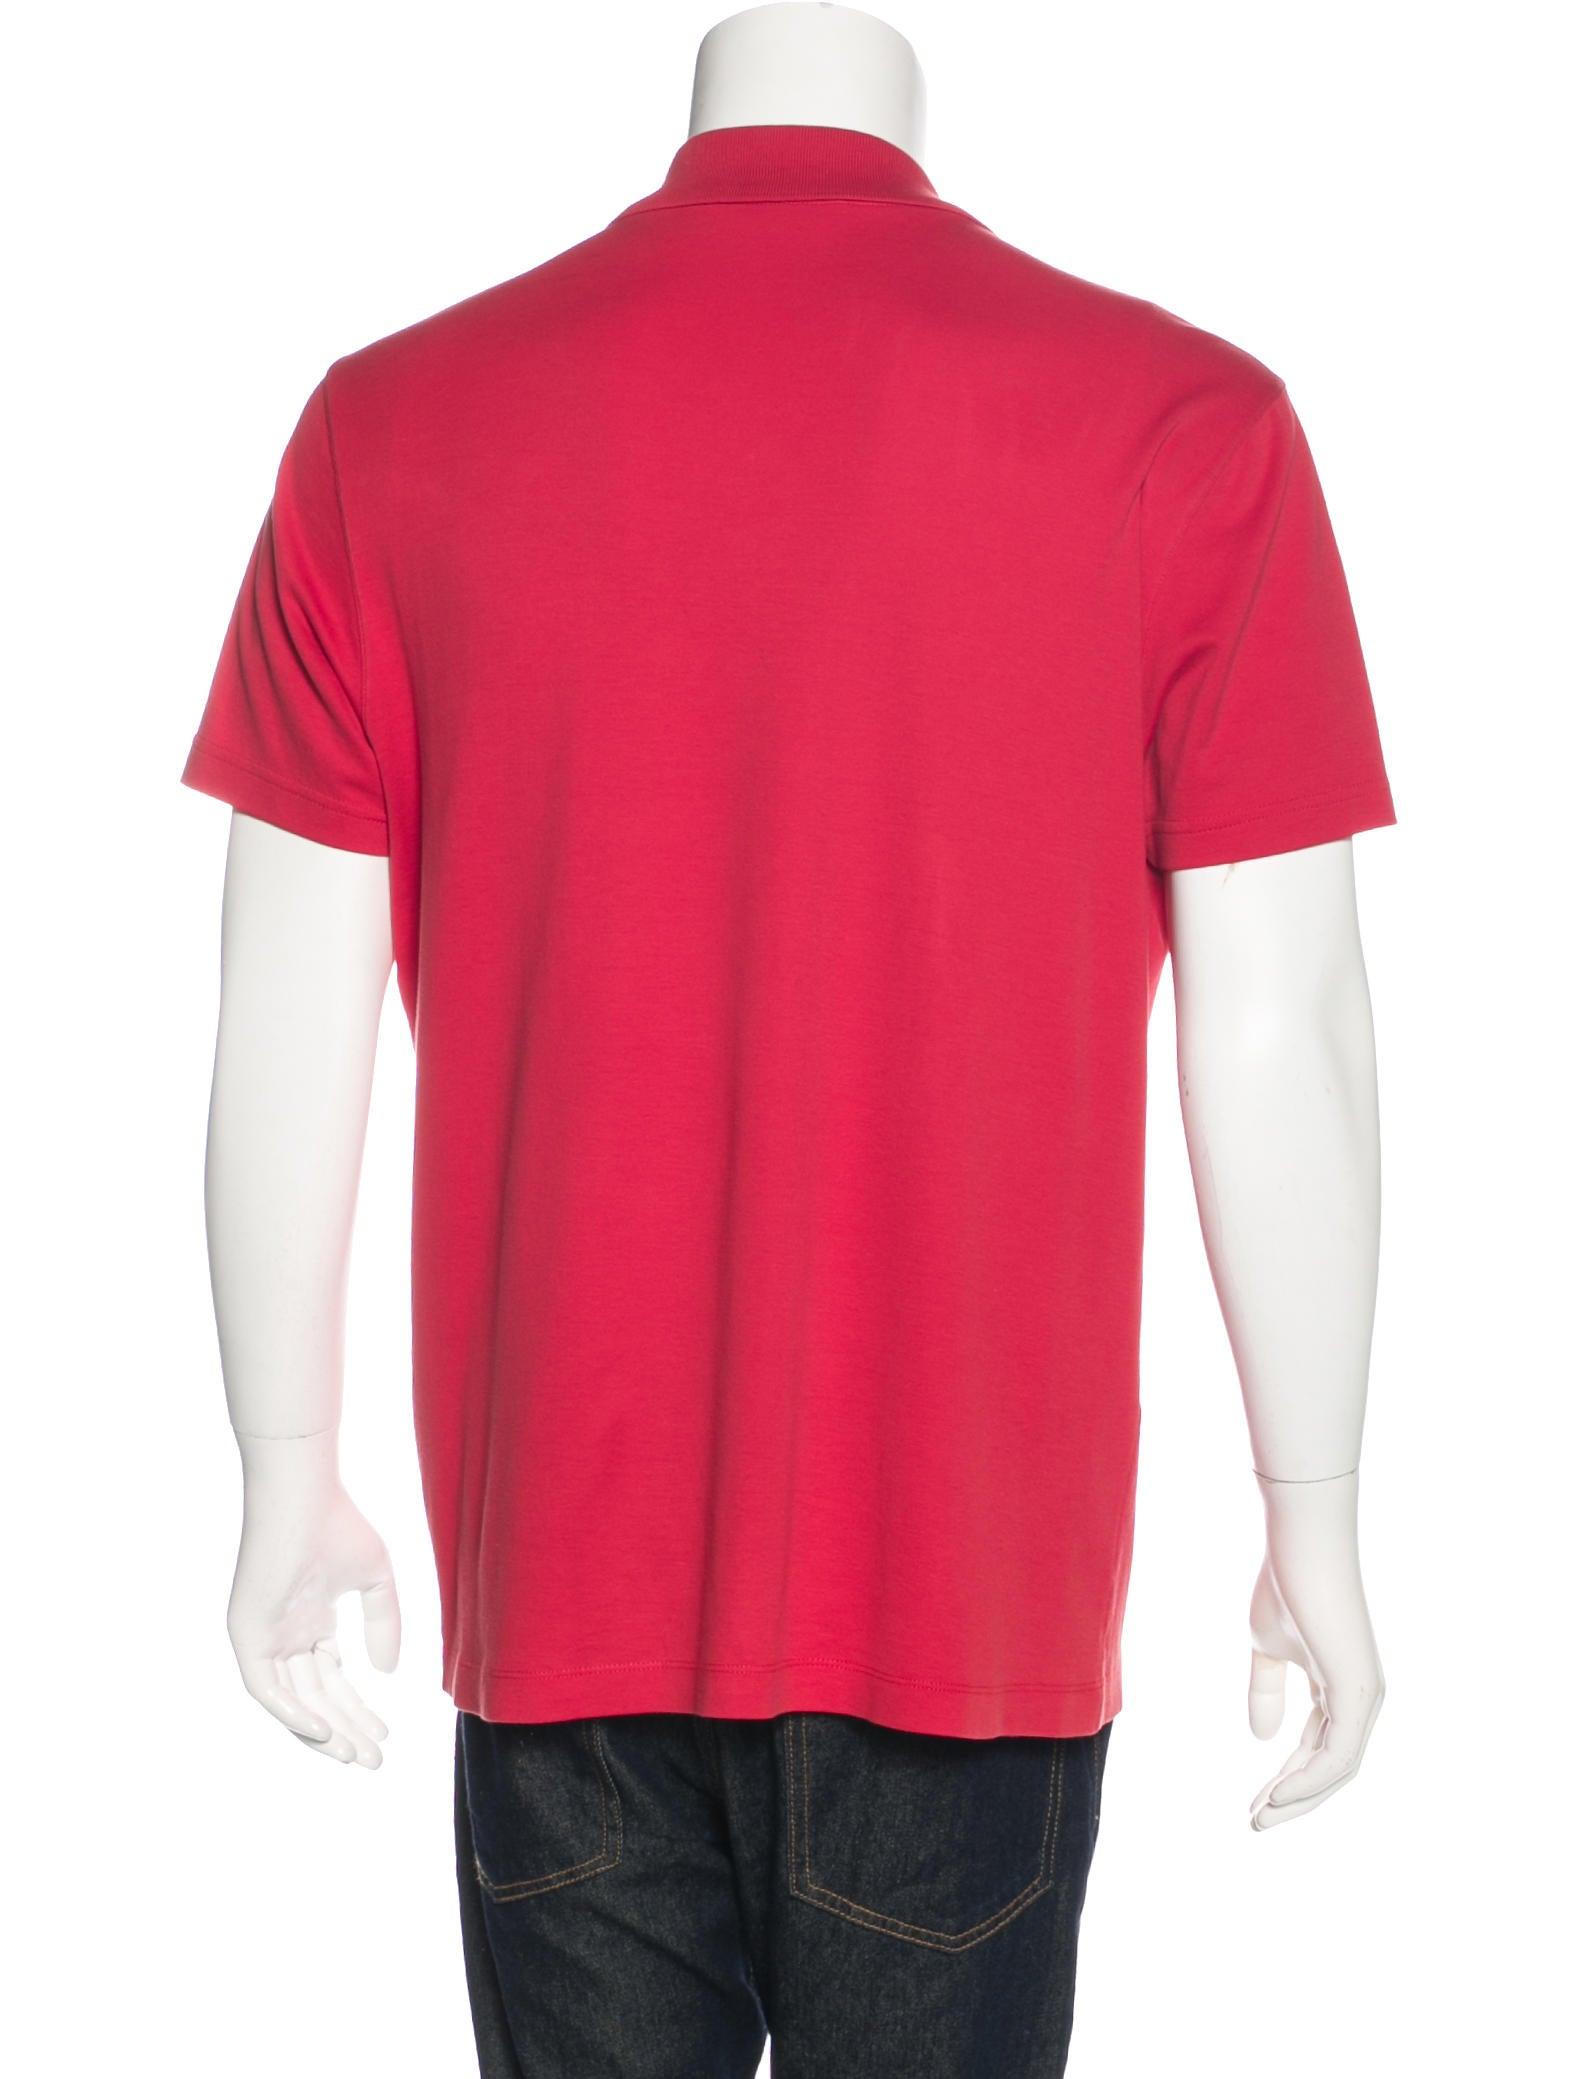 Louis Vuitton Mens Damier Shirt 47